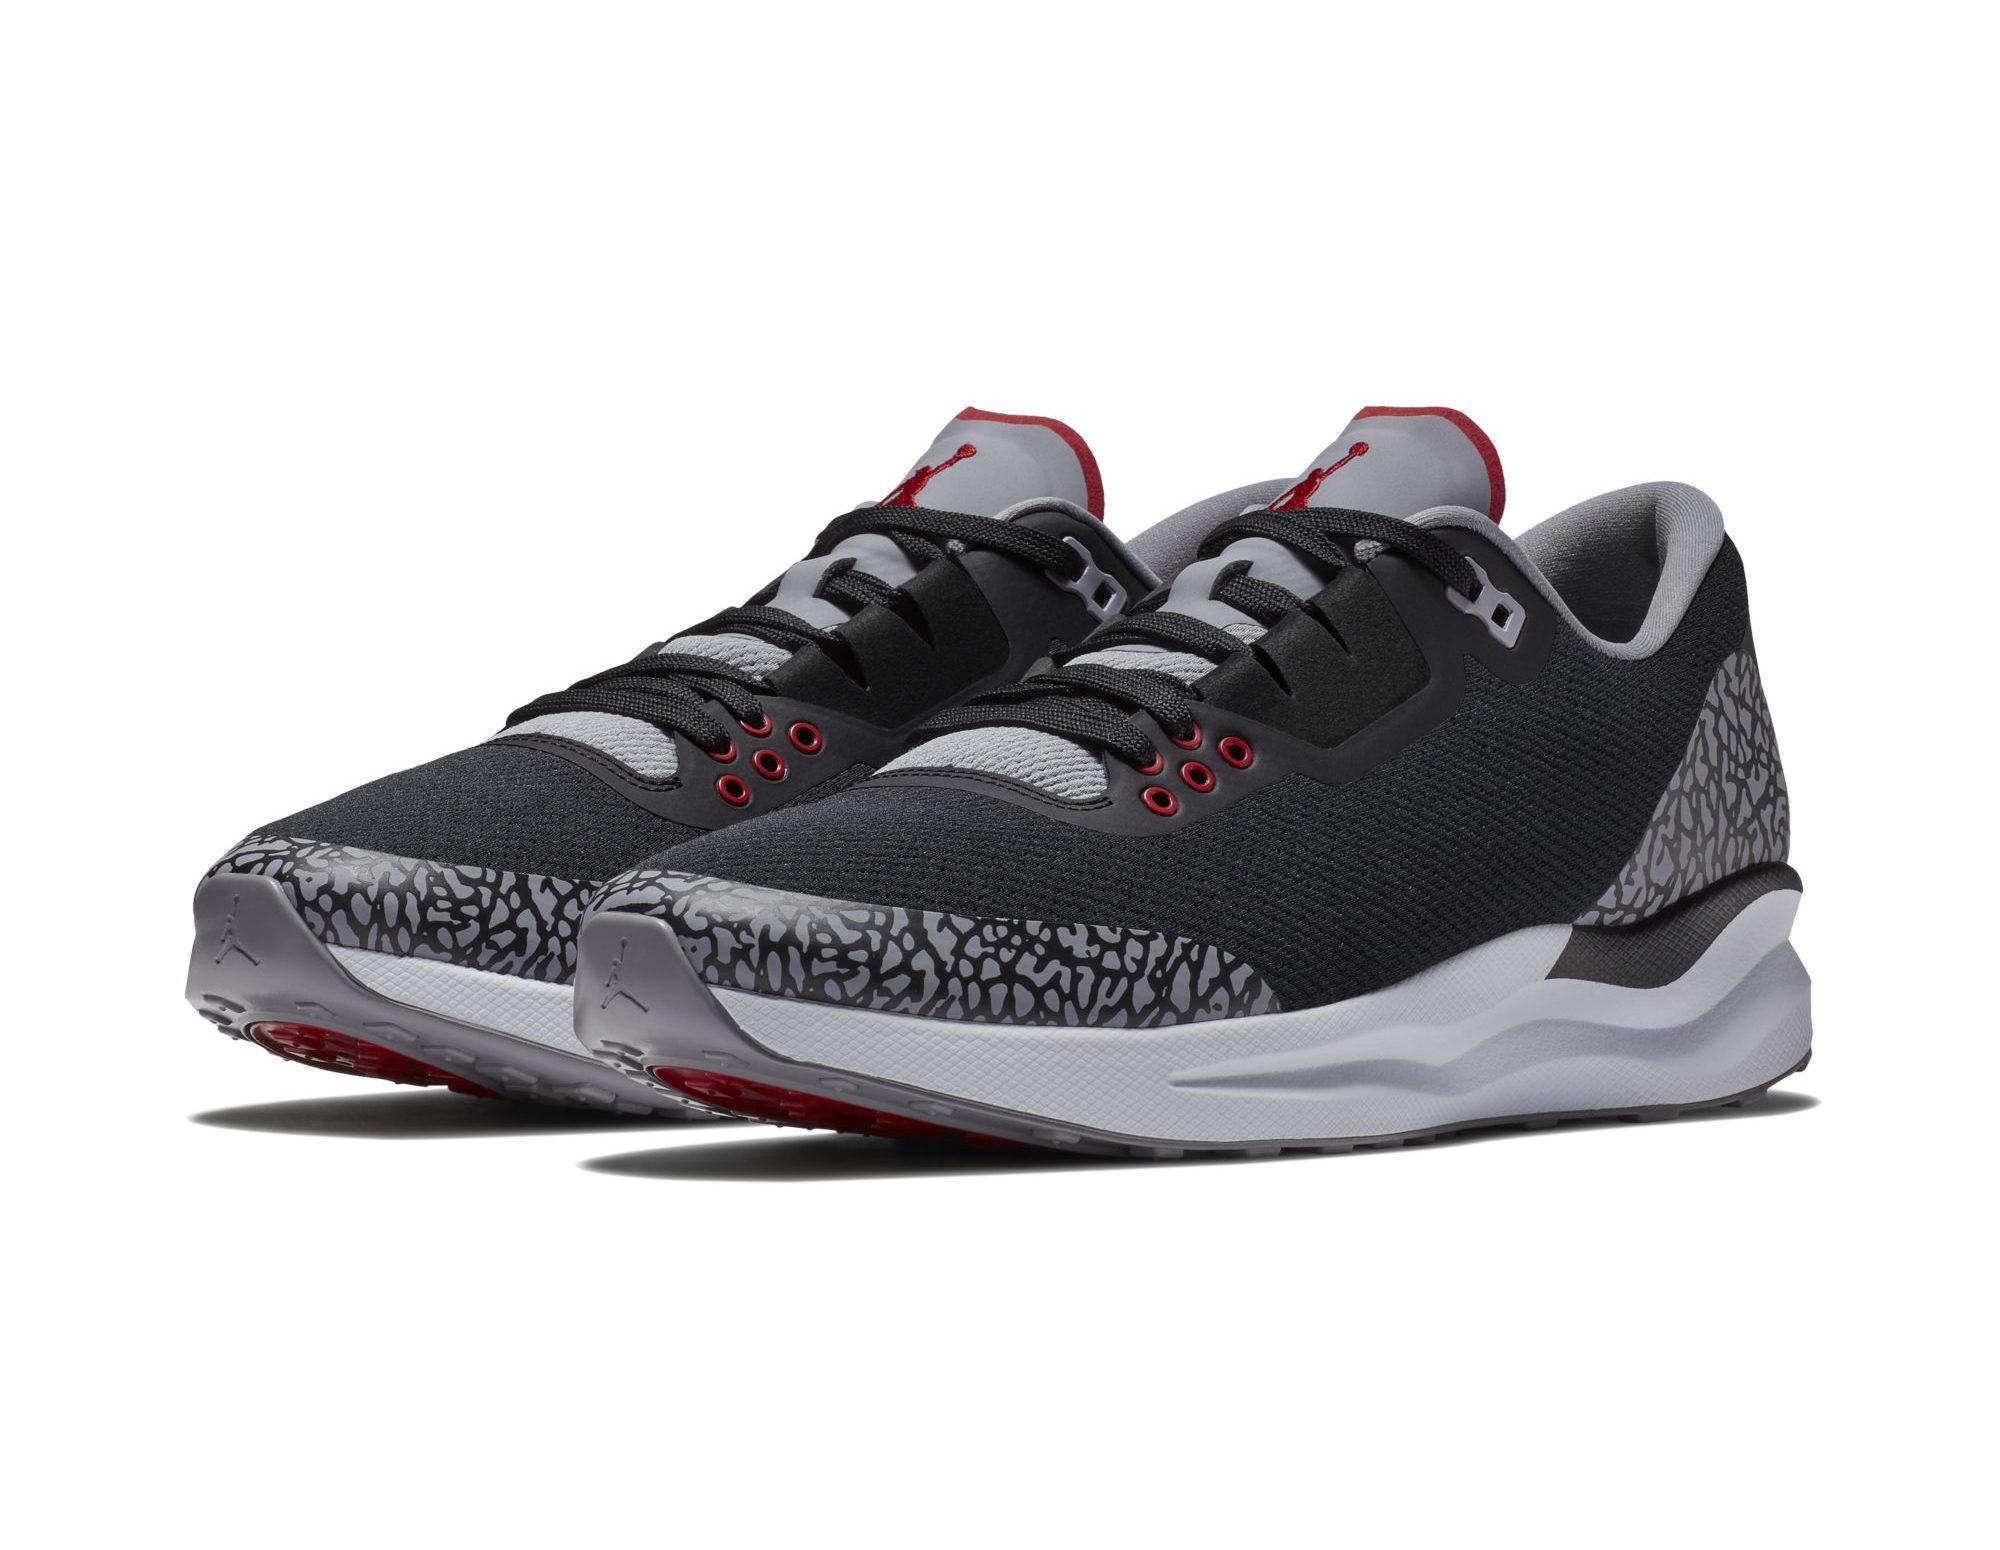 4cec75955146f9 The Jordan Zoom Tenacity 88 Dons OG Air Jordan 3 Colorways - WearTesters